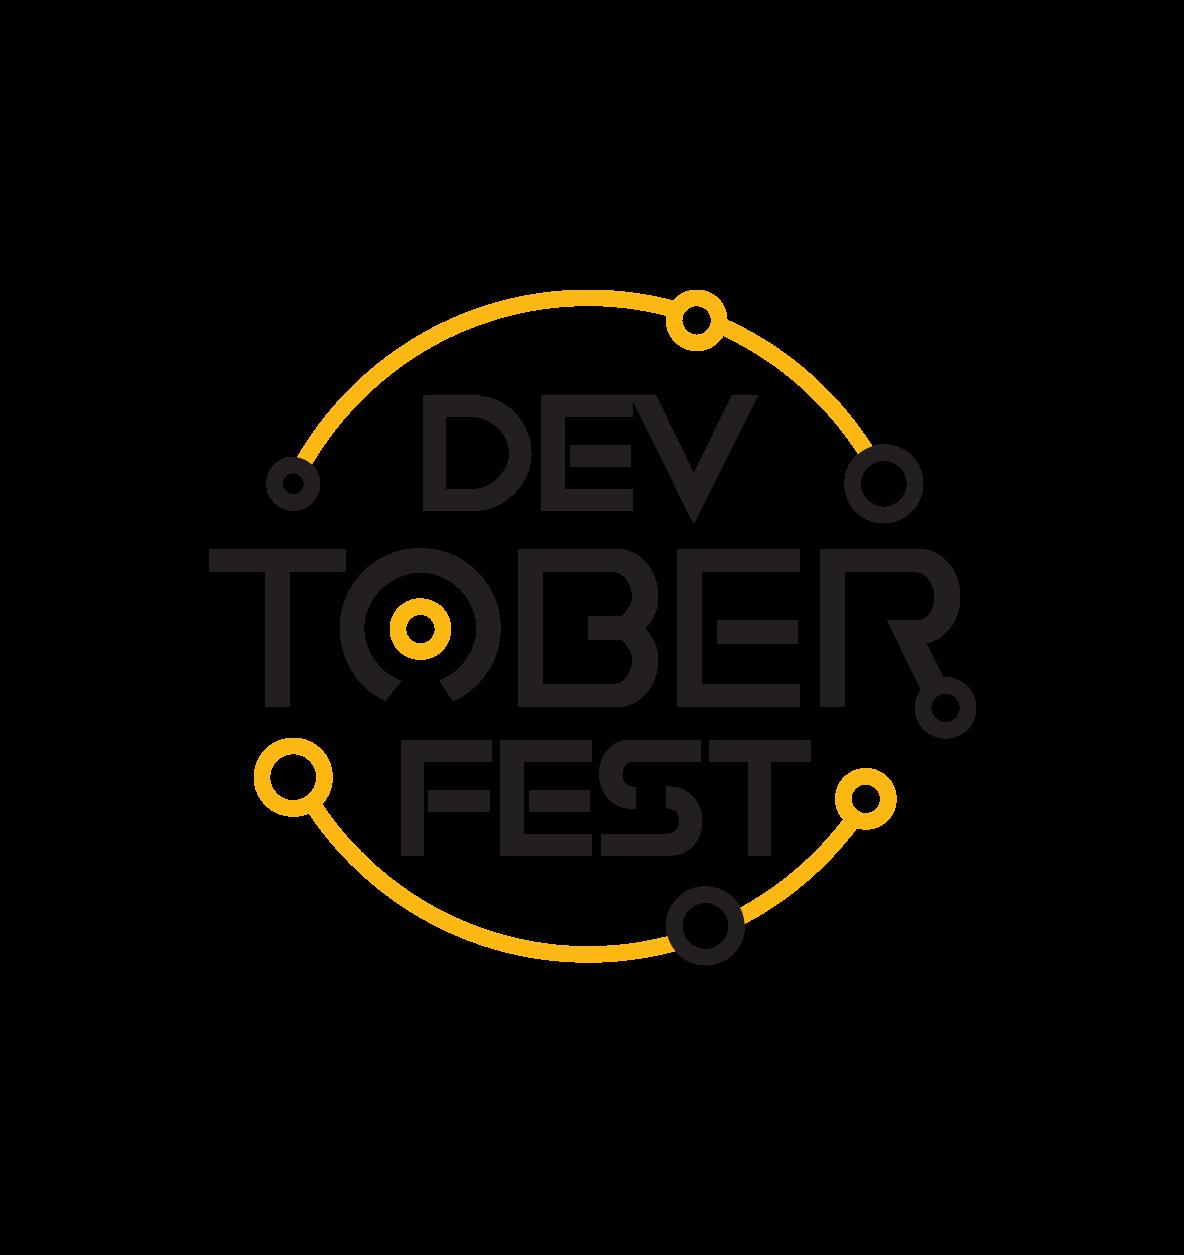 004-Devtoberfest Logo.png